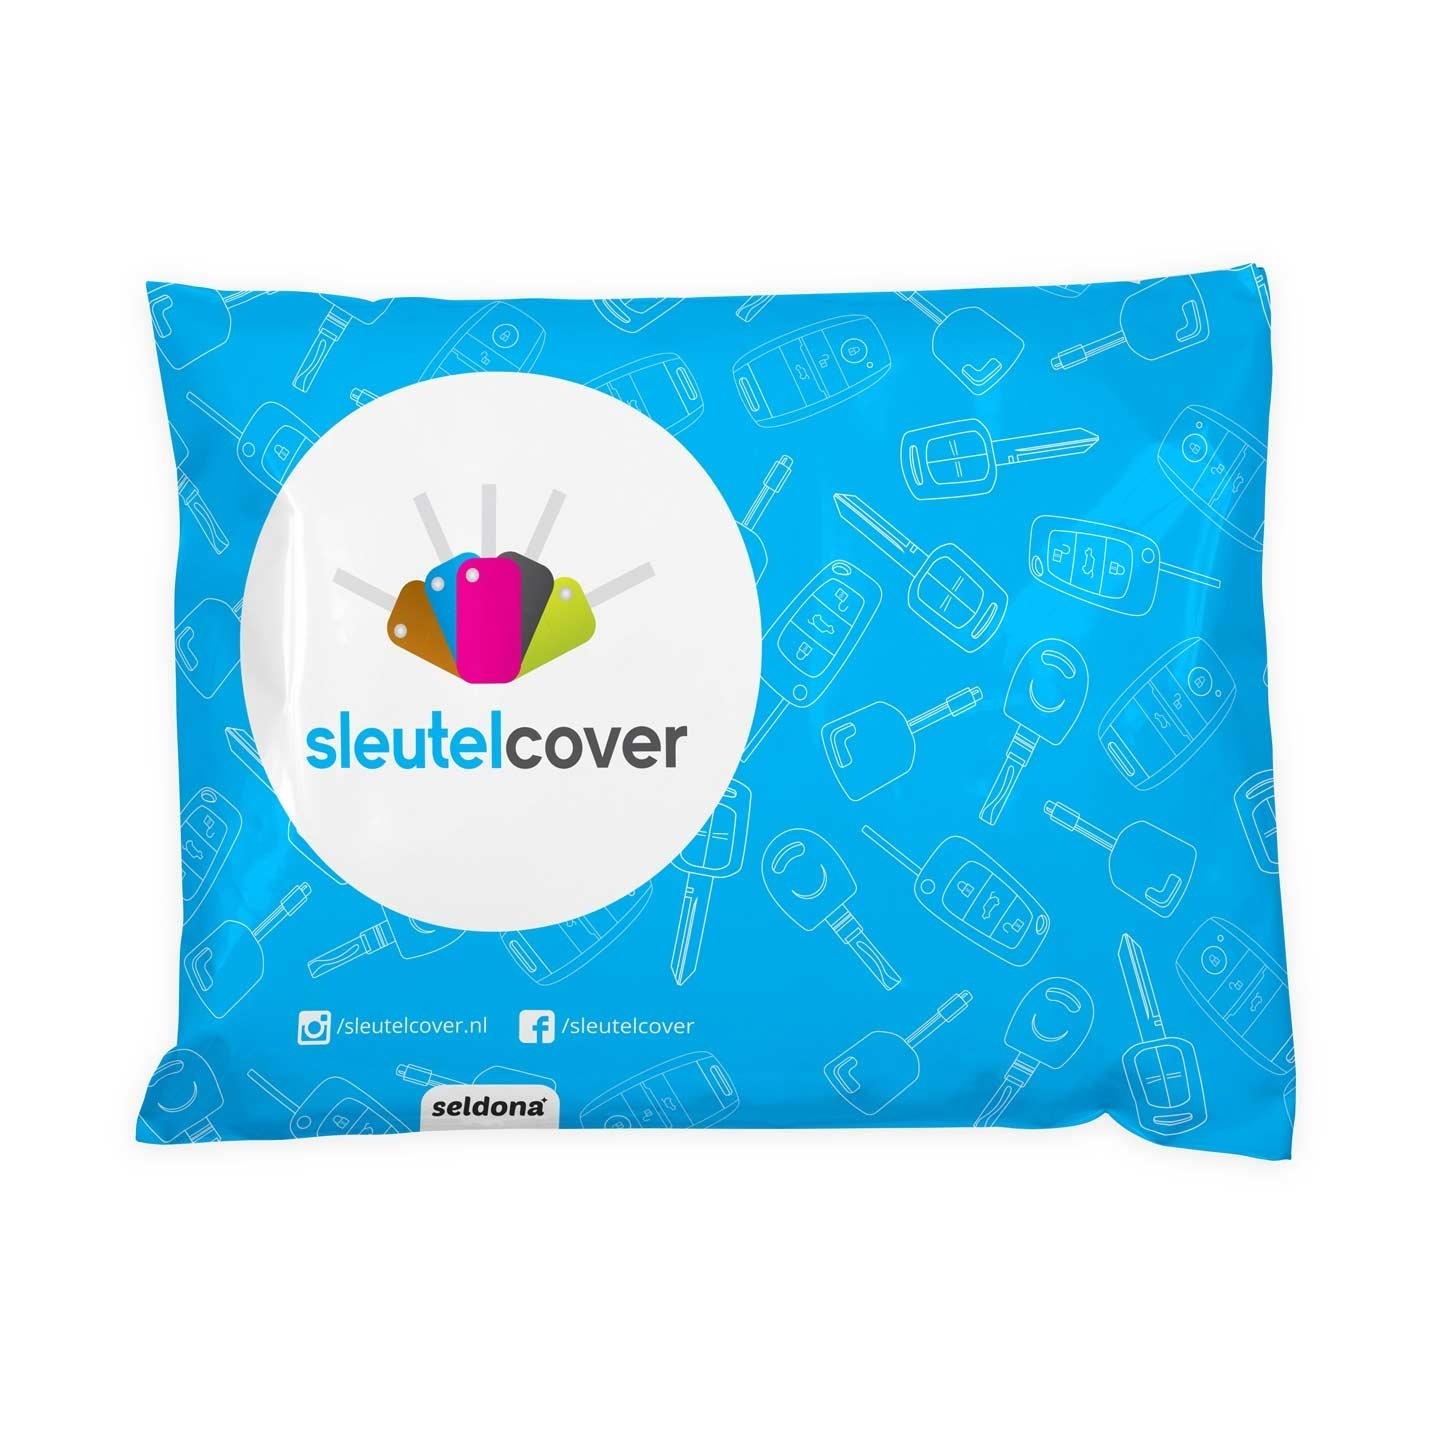 Mitsubishi SleutelCover - Blauw / Silicone sleutelhoesje / beschermhoesje autosleutel